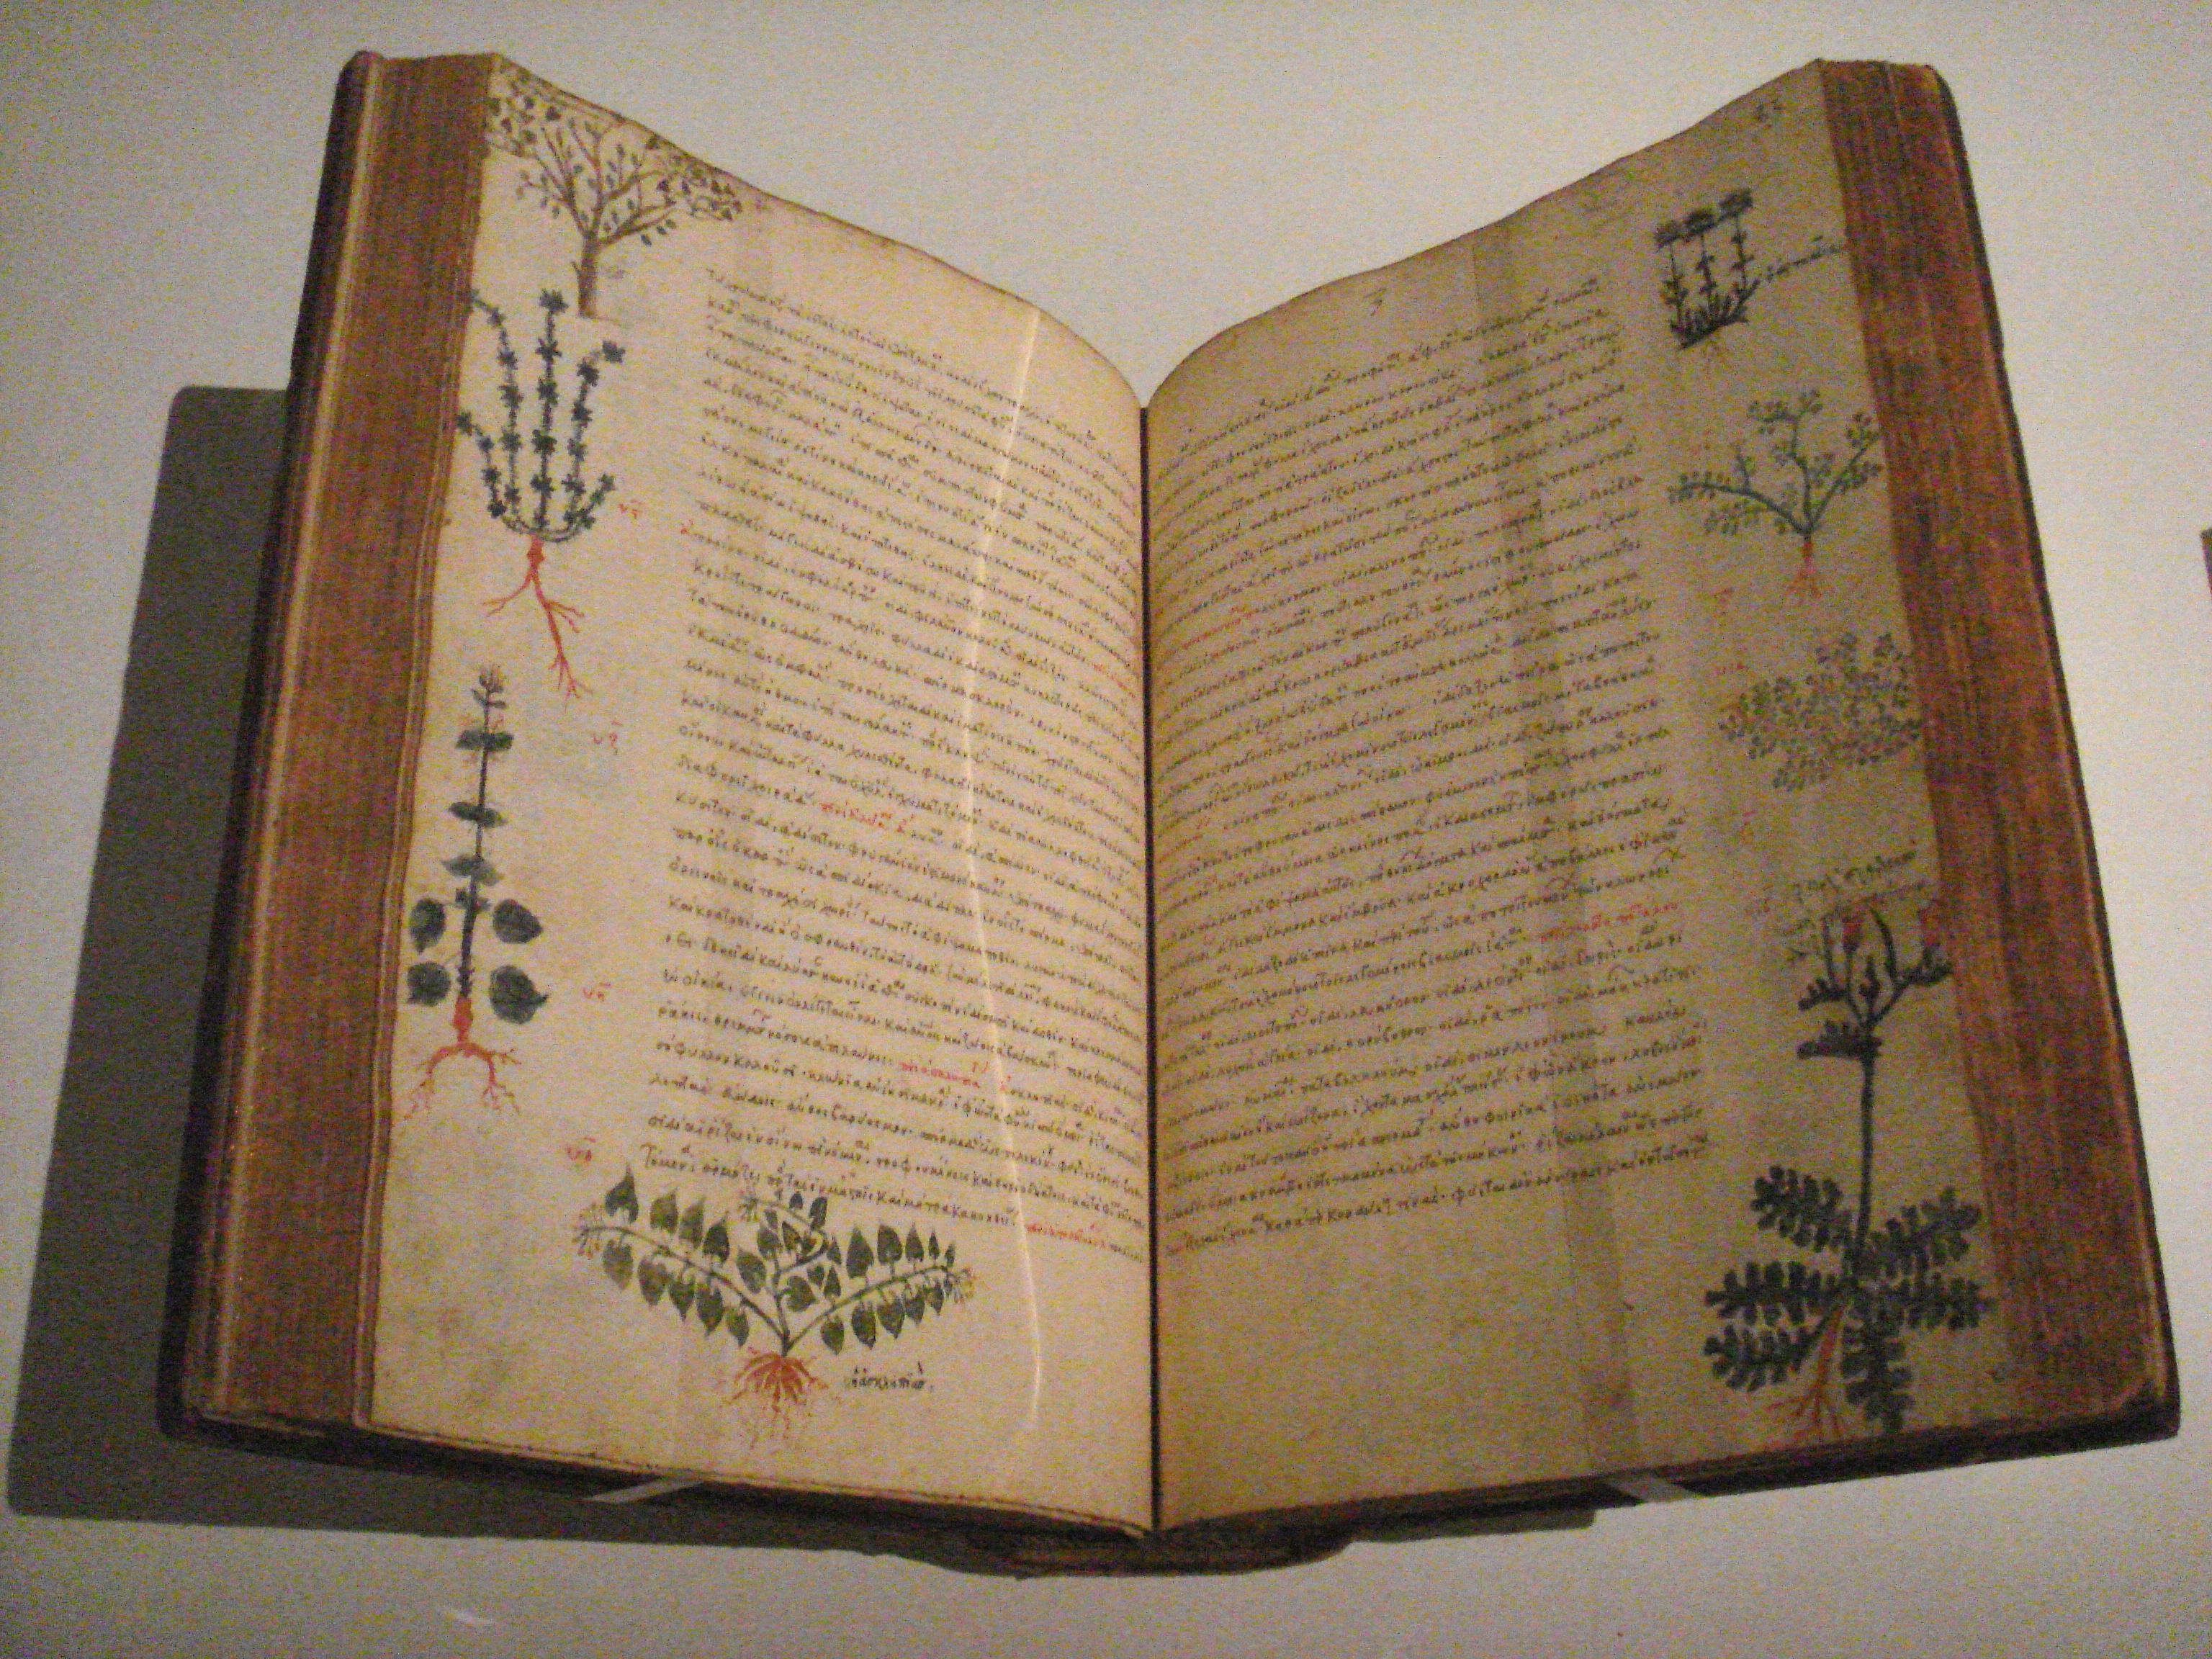 Dioscorides_De_Materia_Medica_Byzantium_15th_century